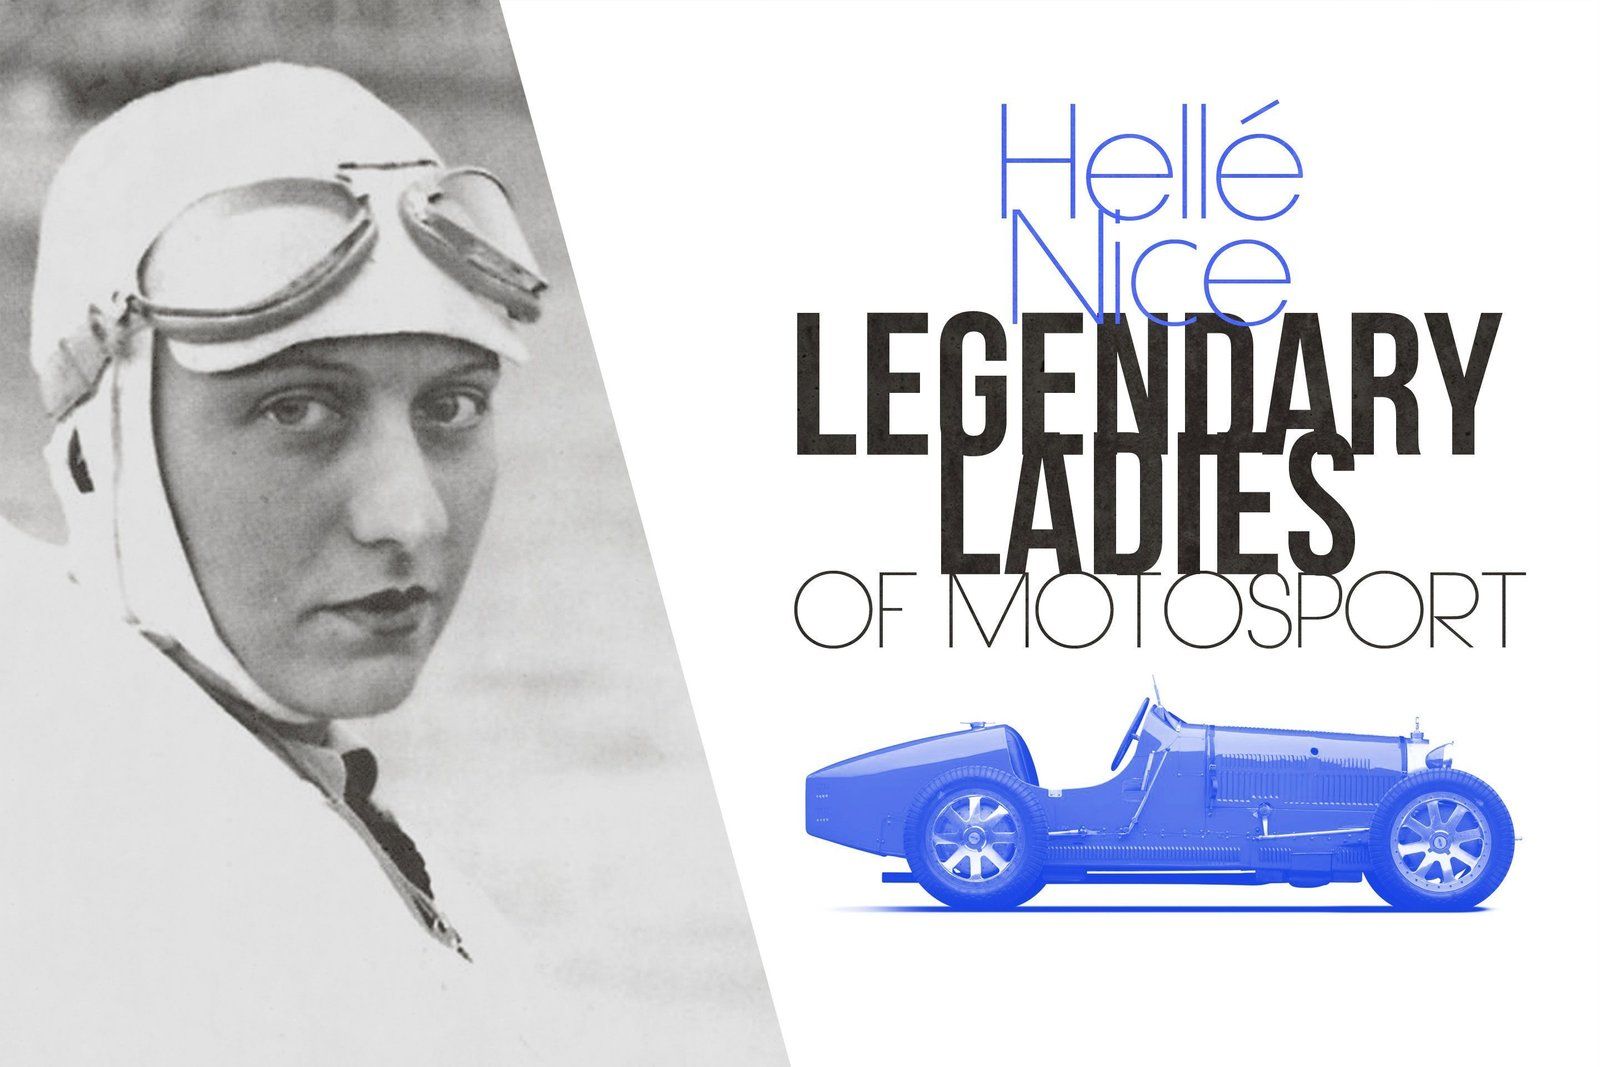 Legendary Ladies Of Motorsport: Hellé Nice - Photo 1 of 9